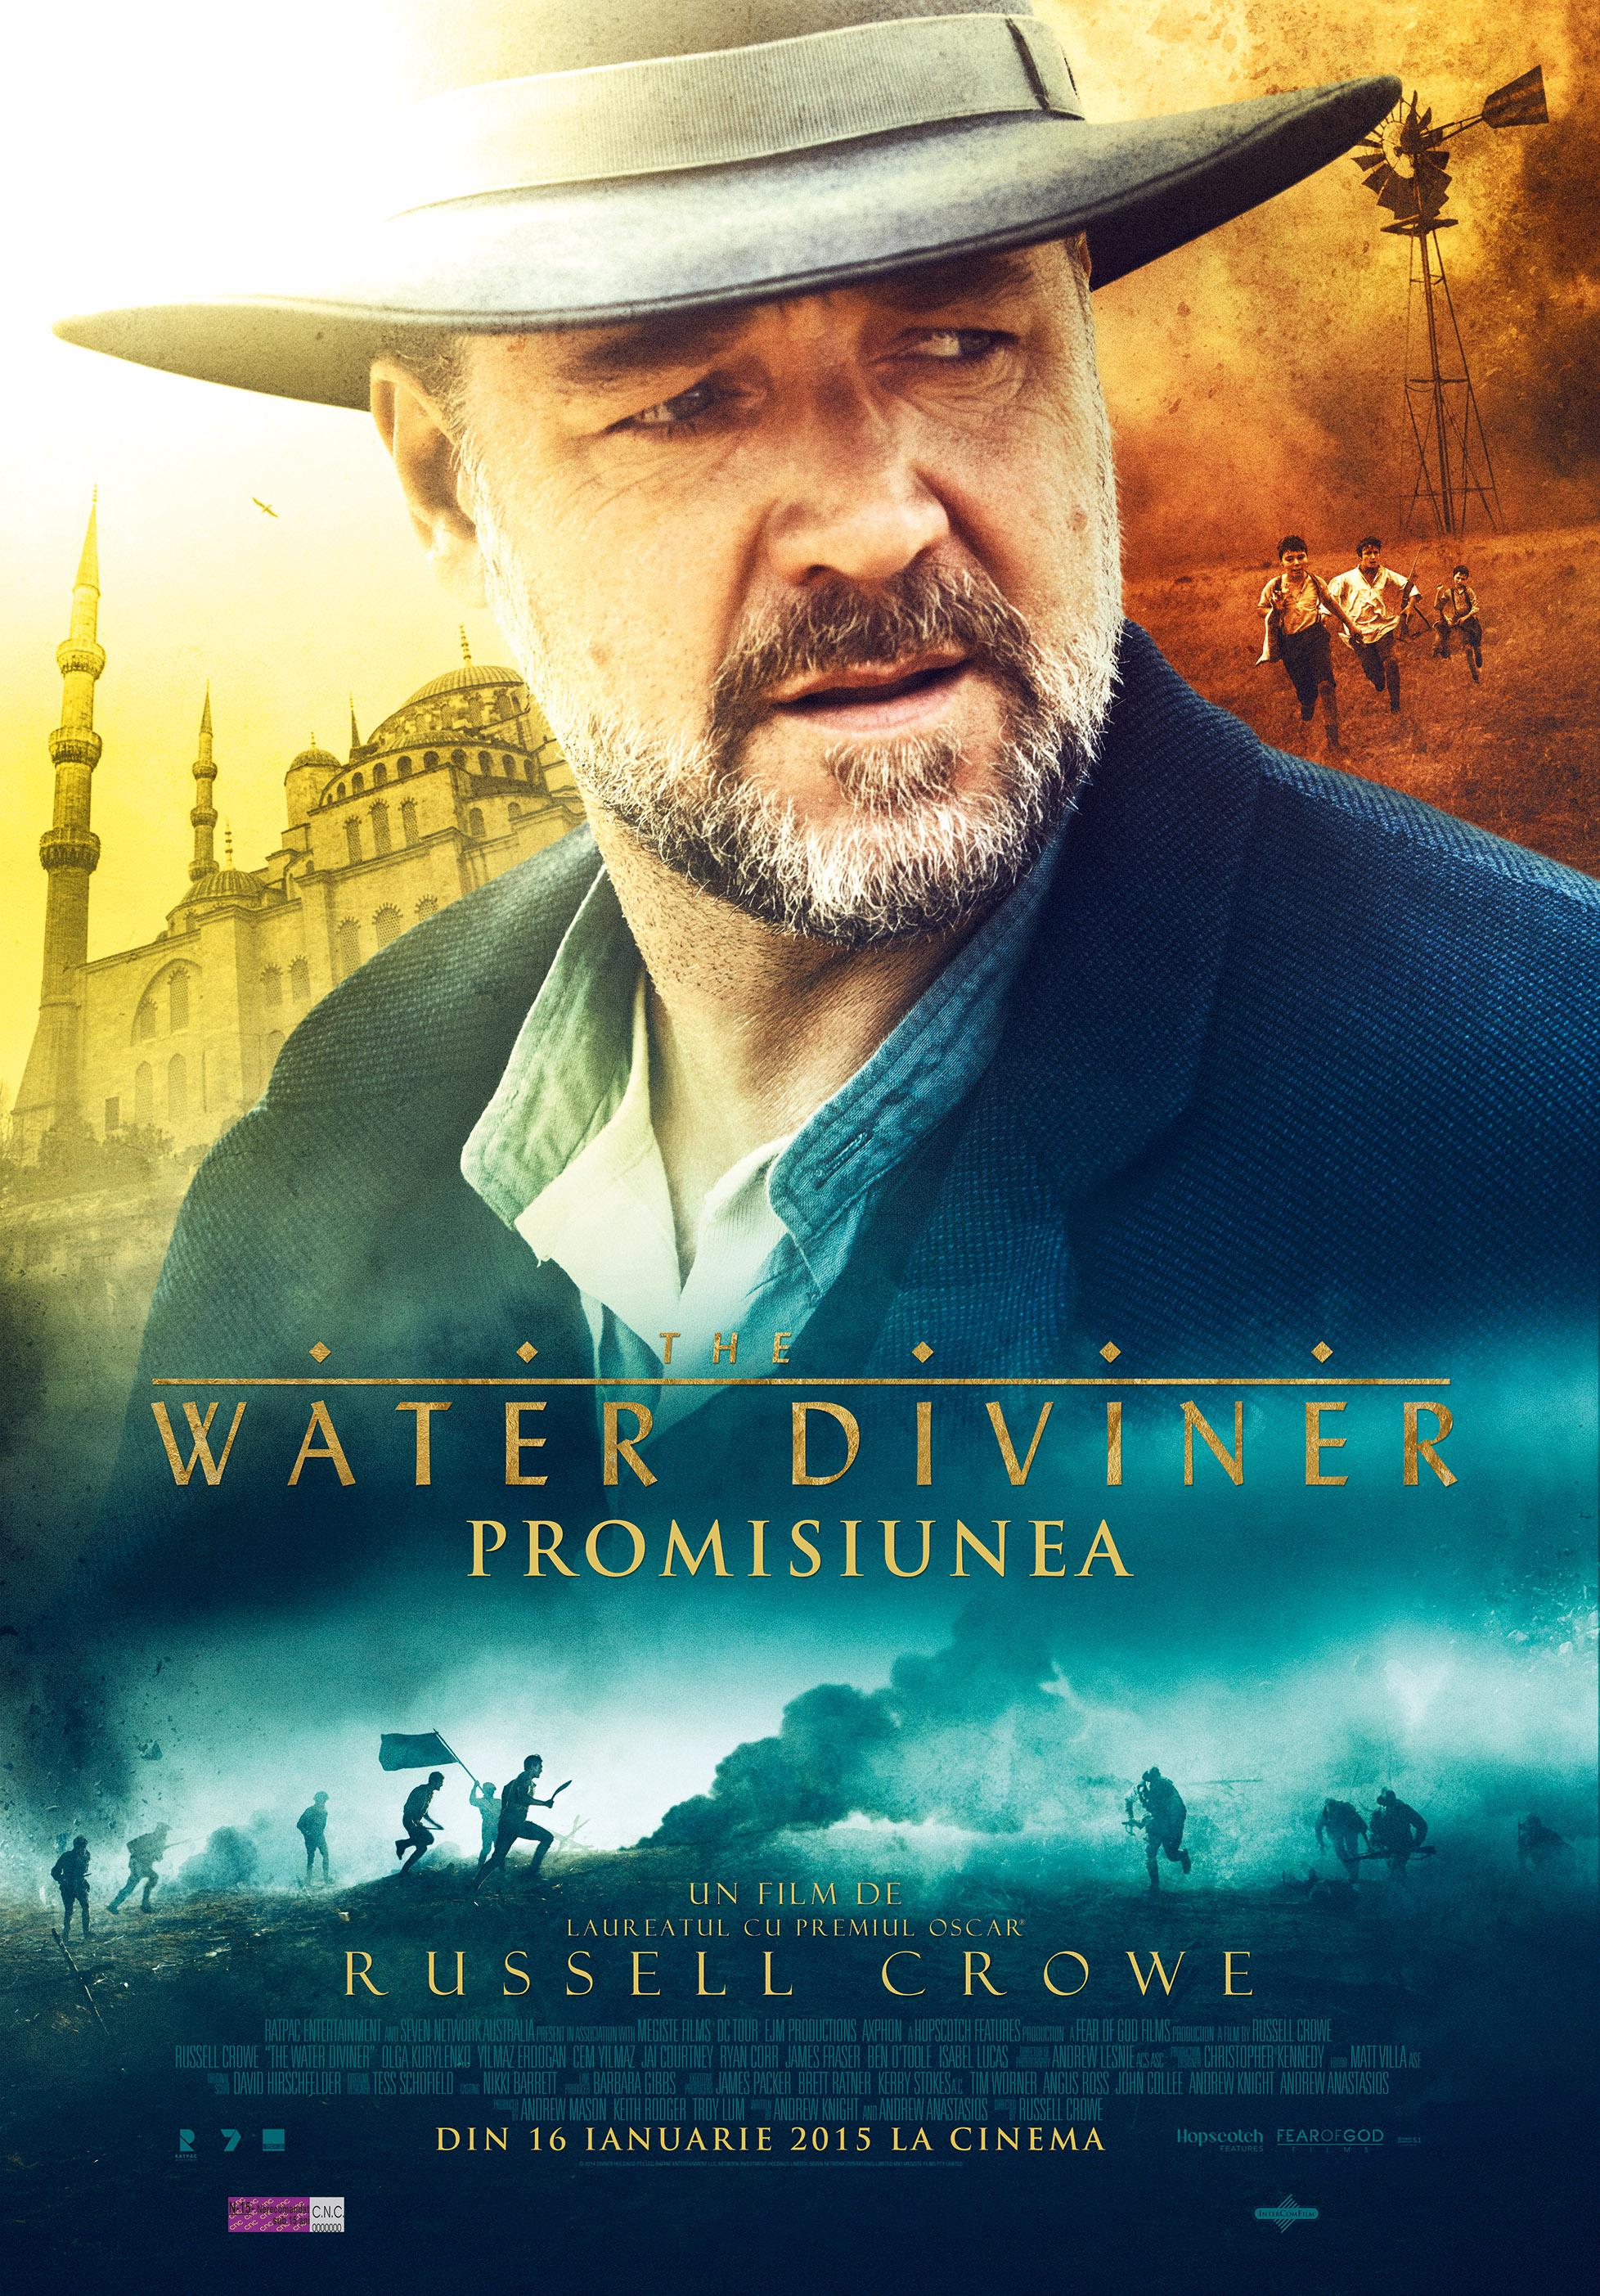 The Water Diviner: Promisiunea (Premiera)